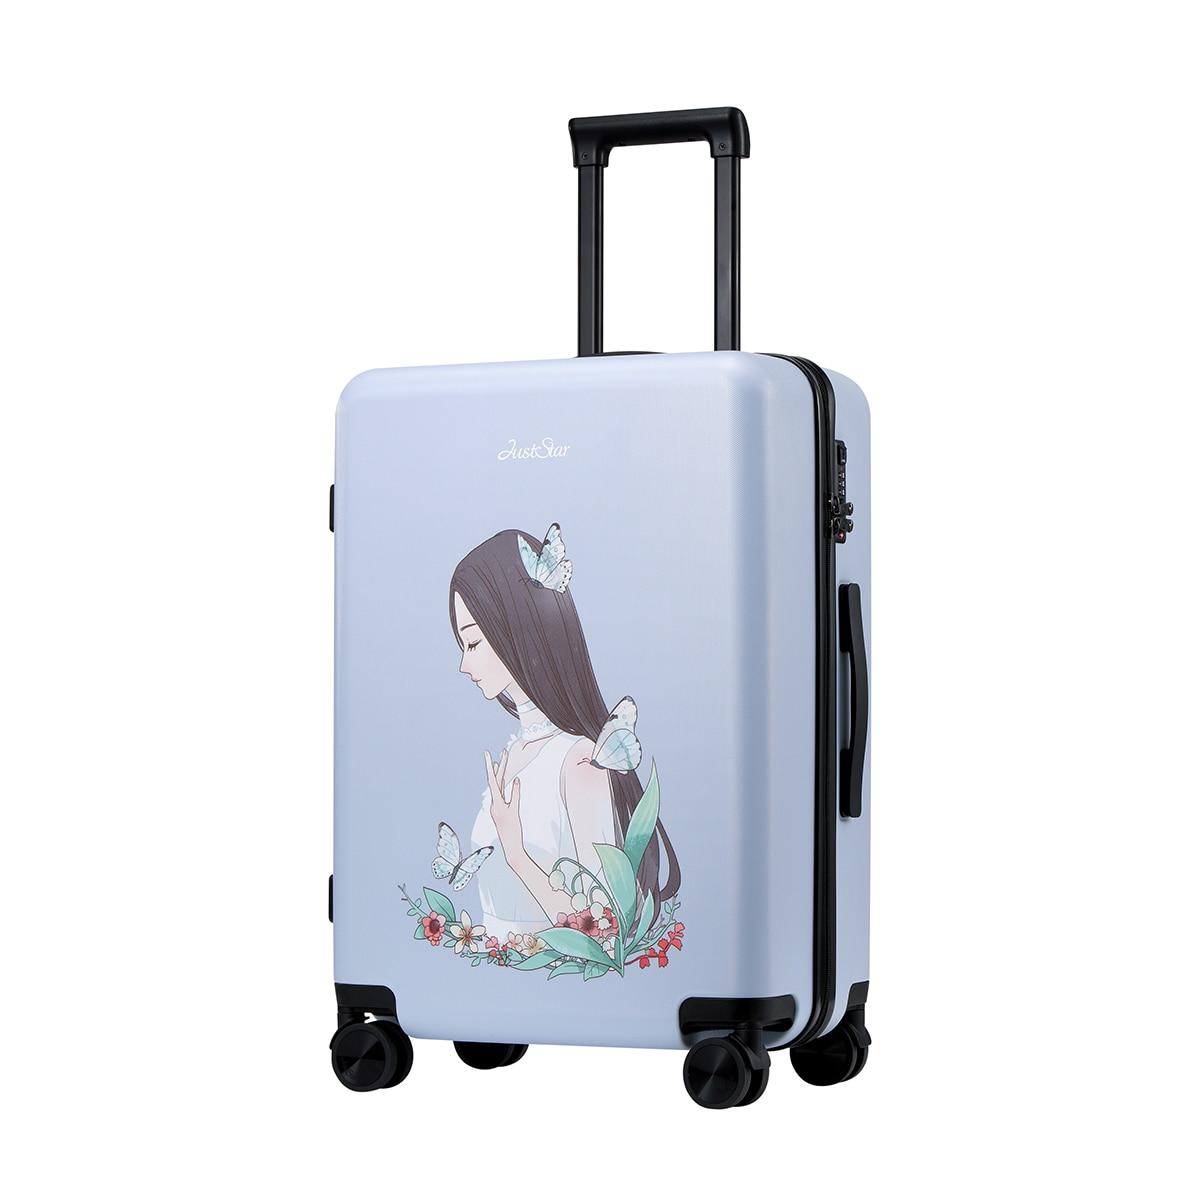 купить Just Star Women Spinner trolley luggage travel case TSA Girls Rolling Luggage PC Hardside Trolley Travel case Boarding Luggage недорого